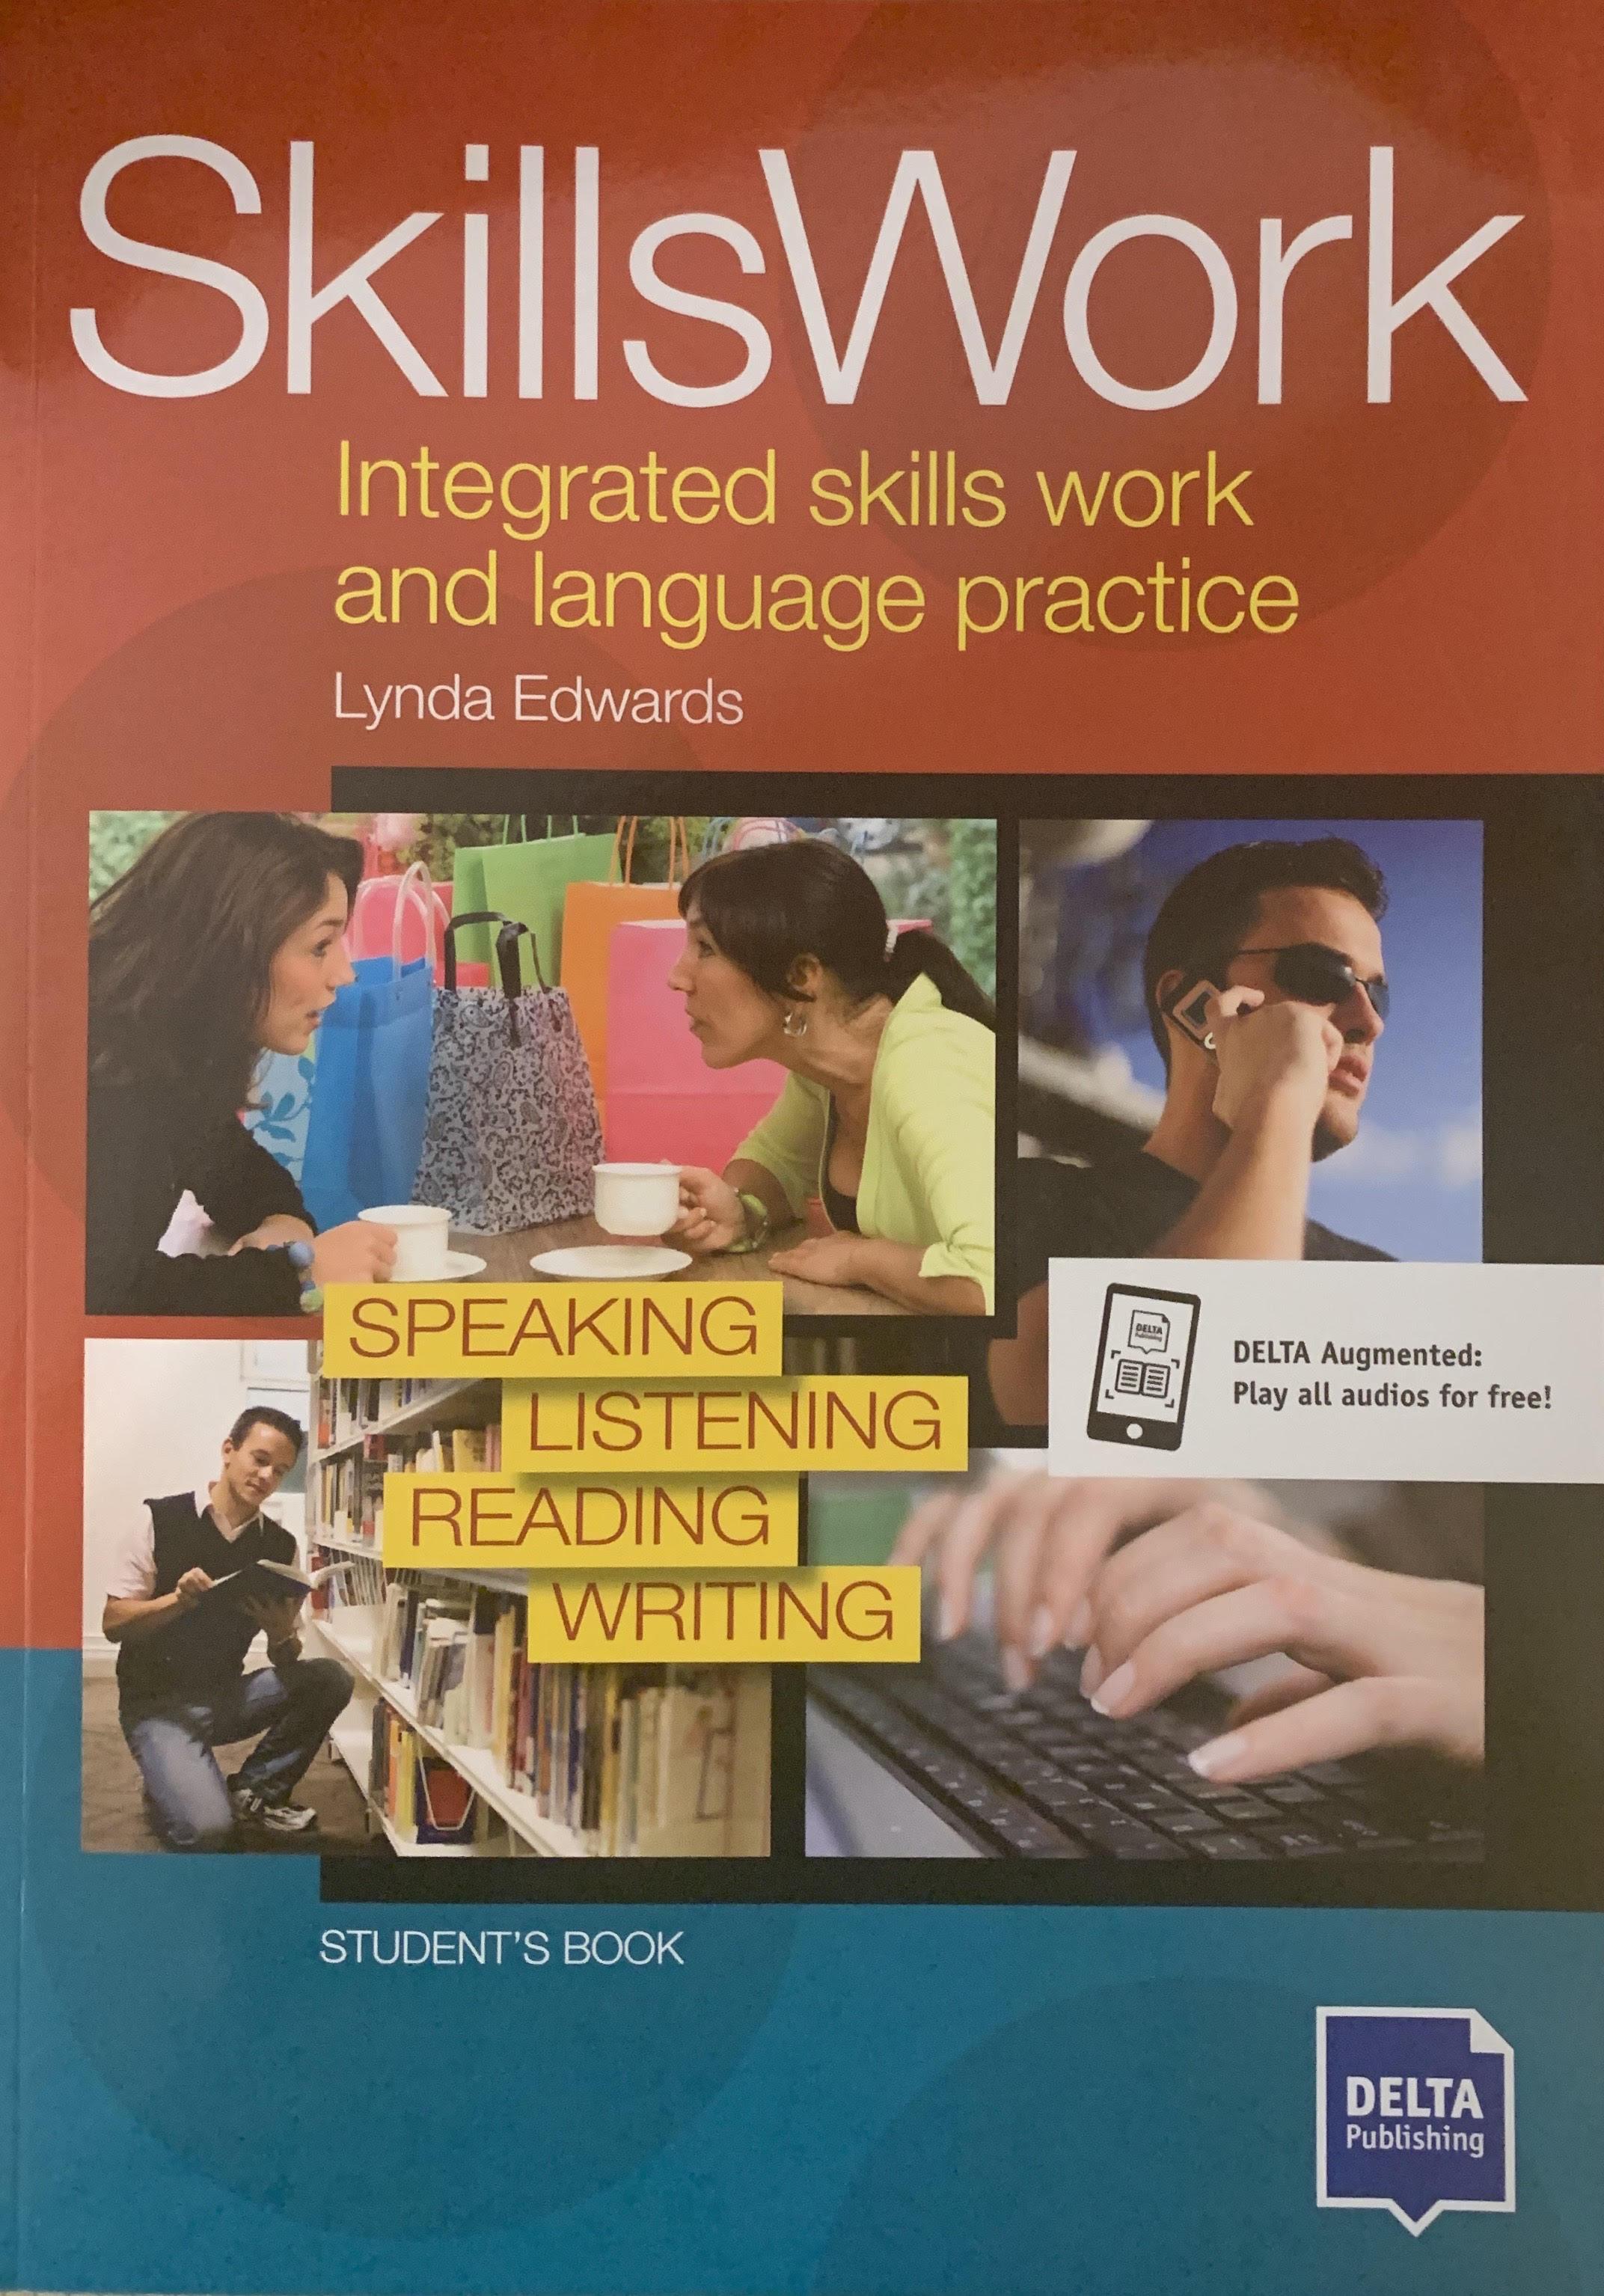 Skills Work Integrated Skills Work and Language Practice